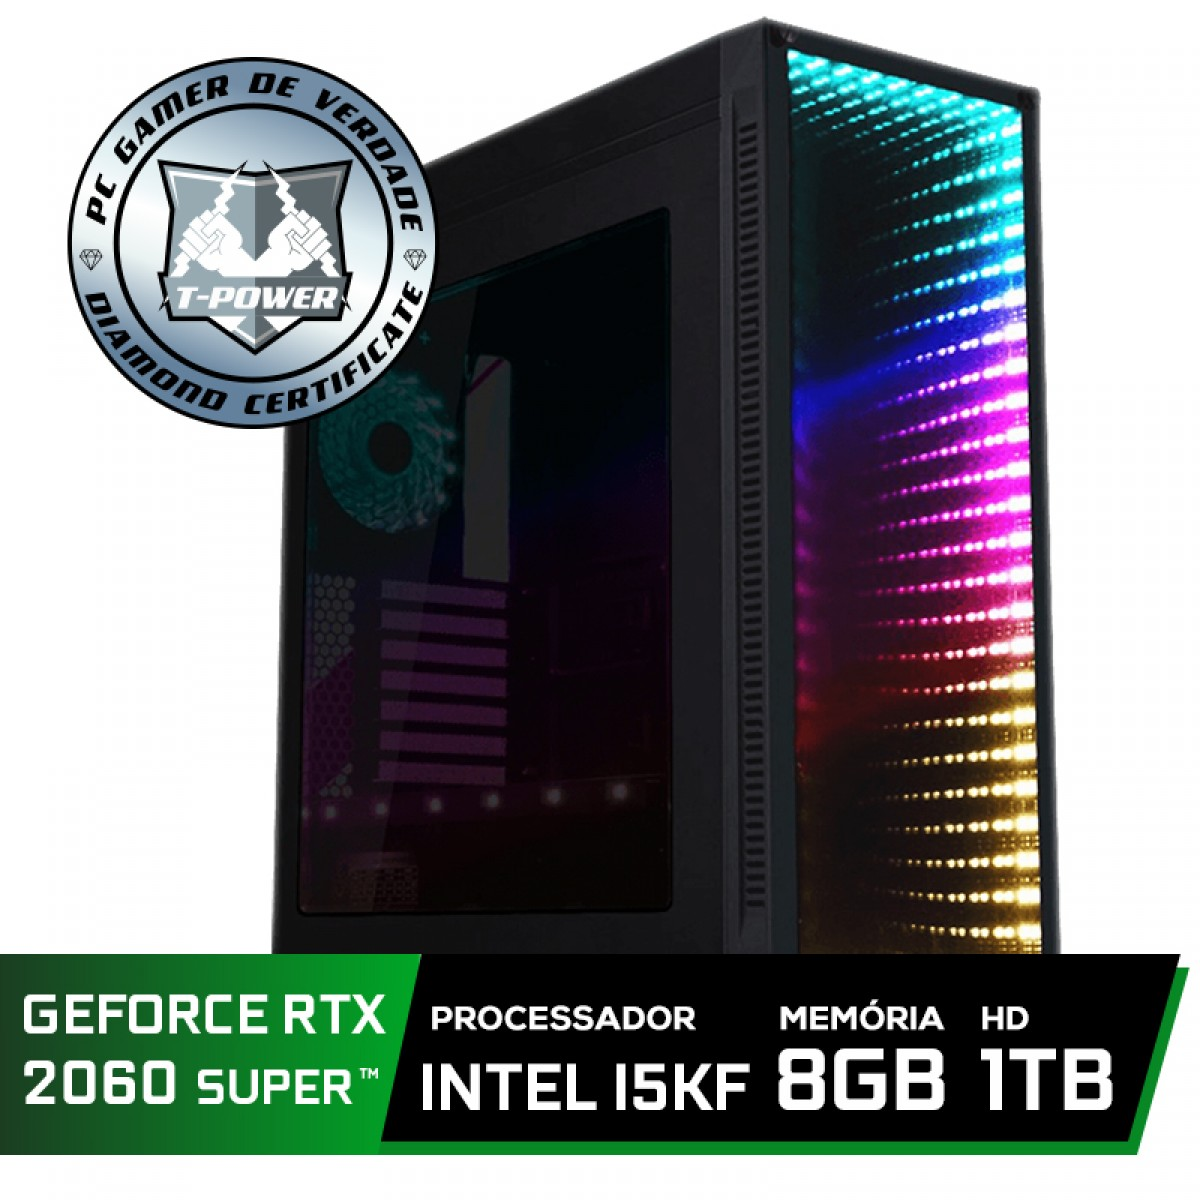 Pc Gamer Super Tera Edition Intel i5 9600KF / Geforce RTX 2060 Super / DDR4 8GB / HD 1TB / 600W